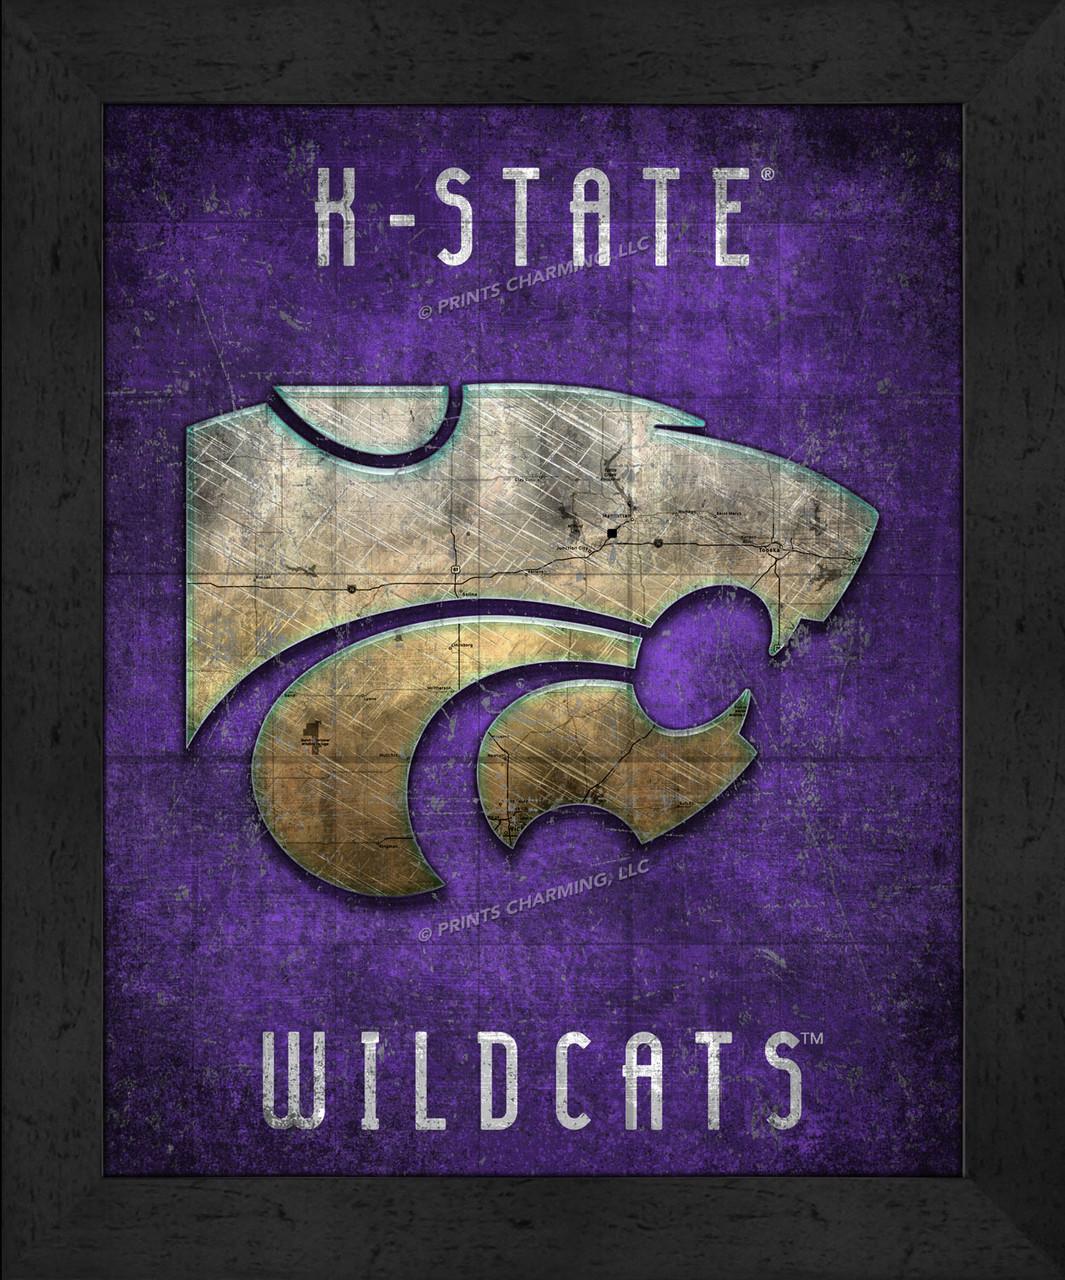 17 Best Wish List images | Kansas state wildcats, Kansas